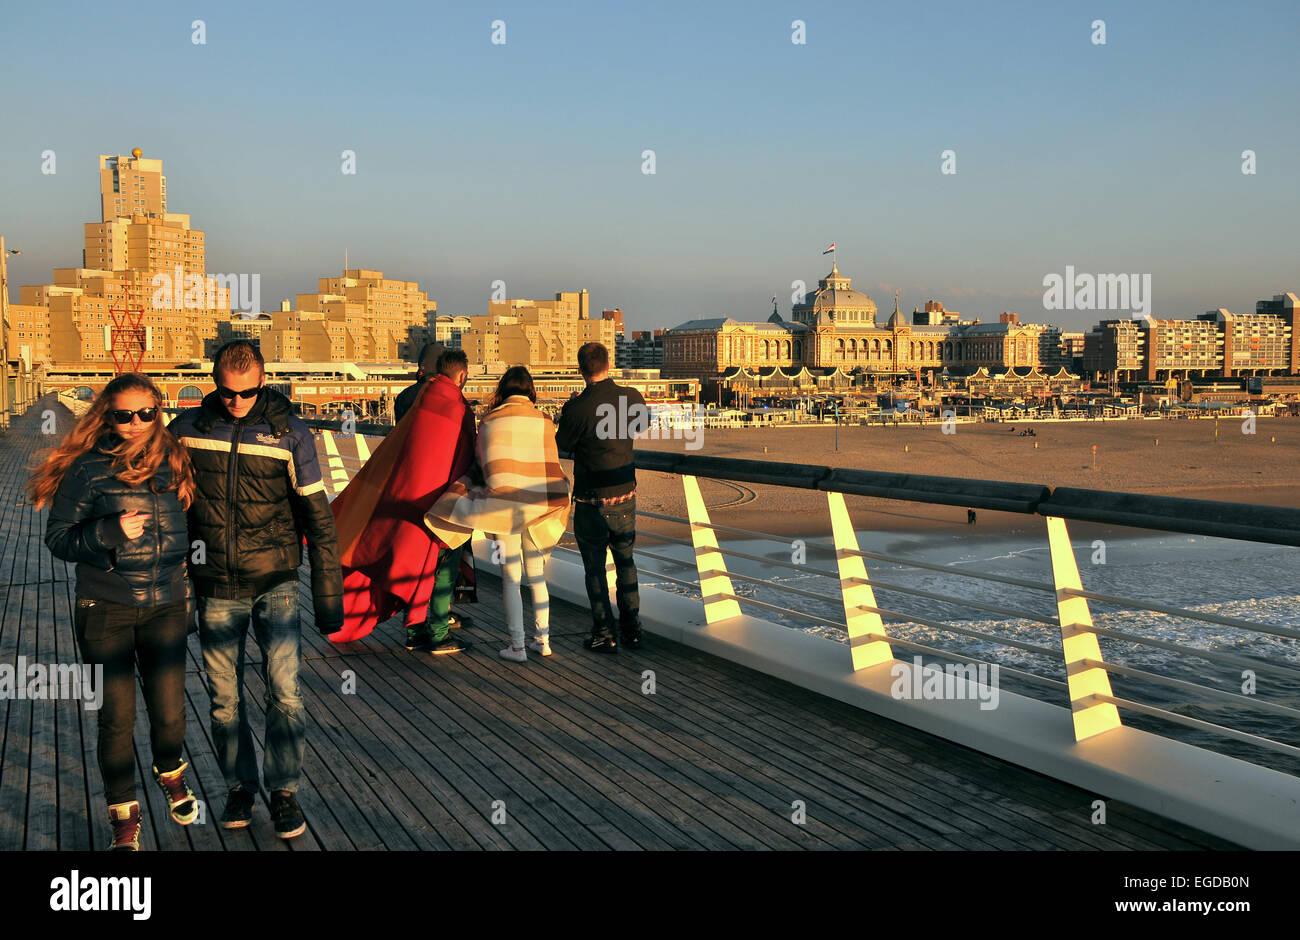 Casino Pier, Scheveningen on the North sea coast, Den Haag, The Netherlands - Stock Image